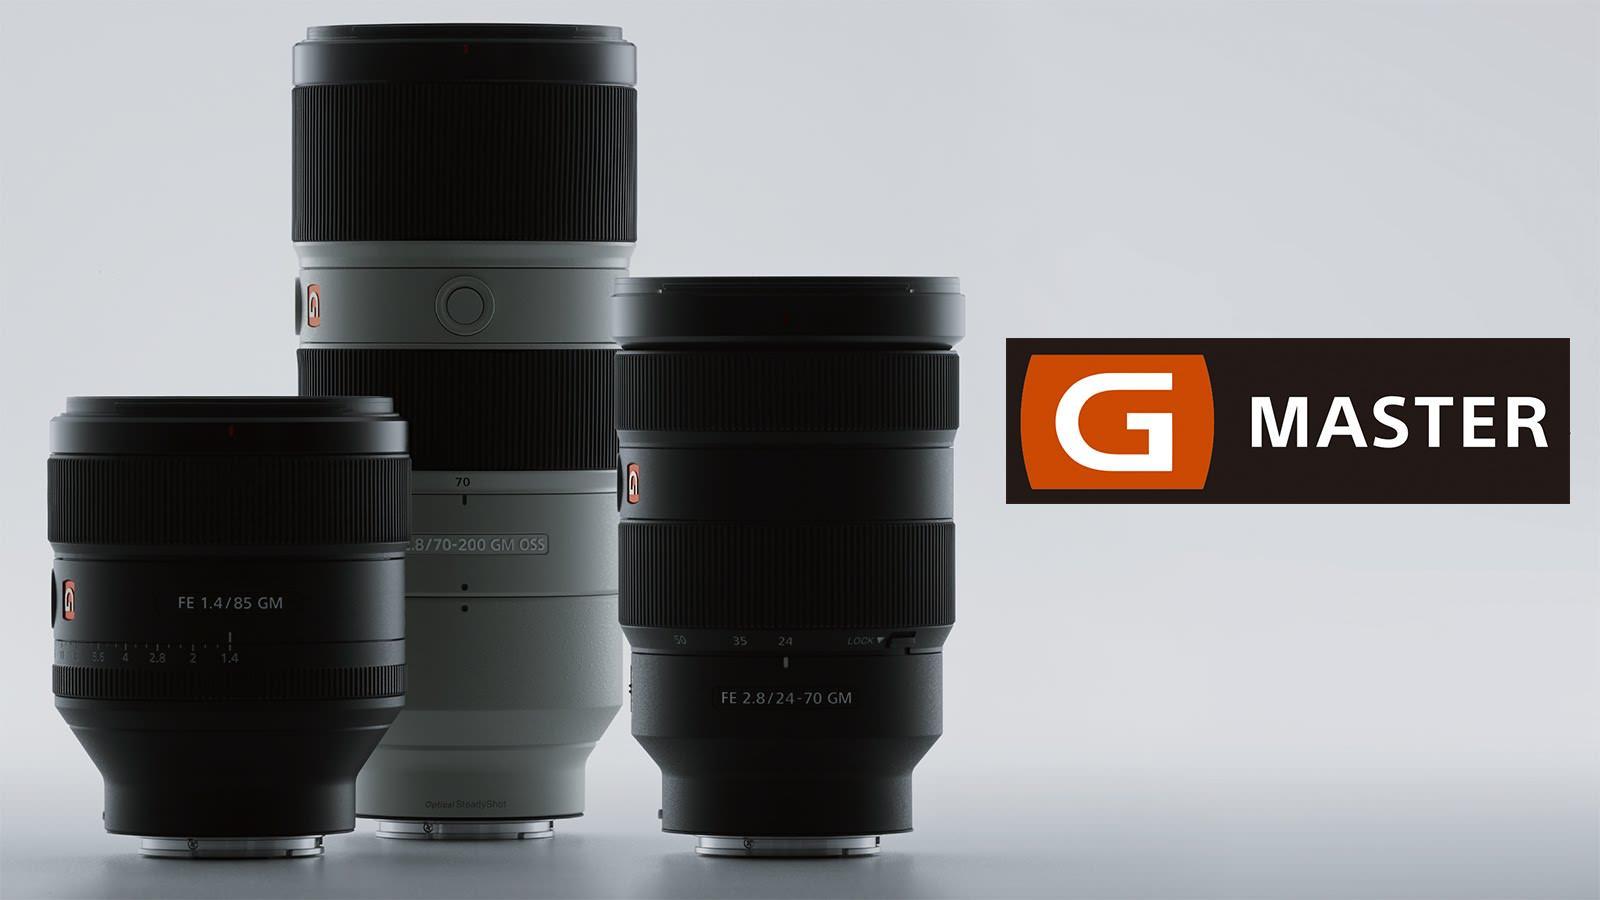 SONY 新推出G Master系列鏡頭